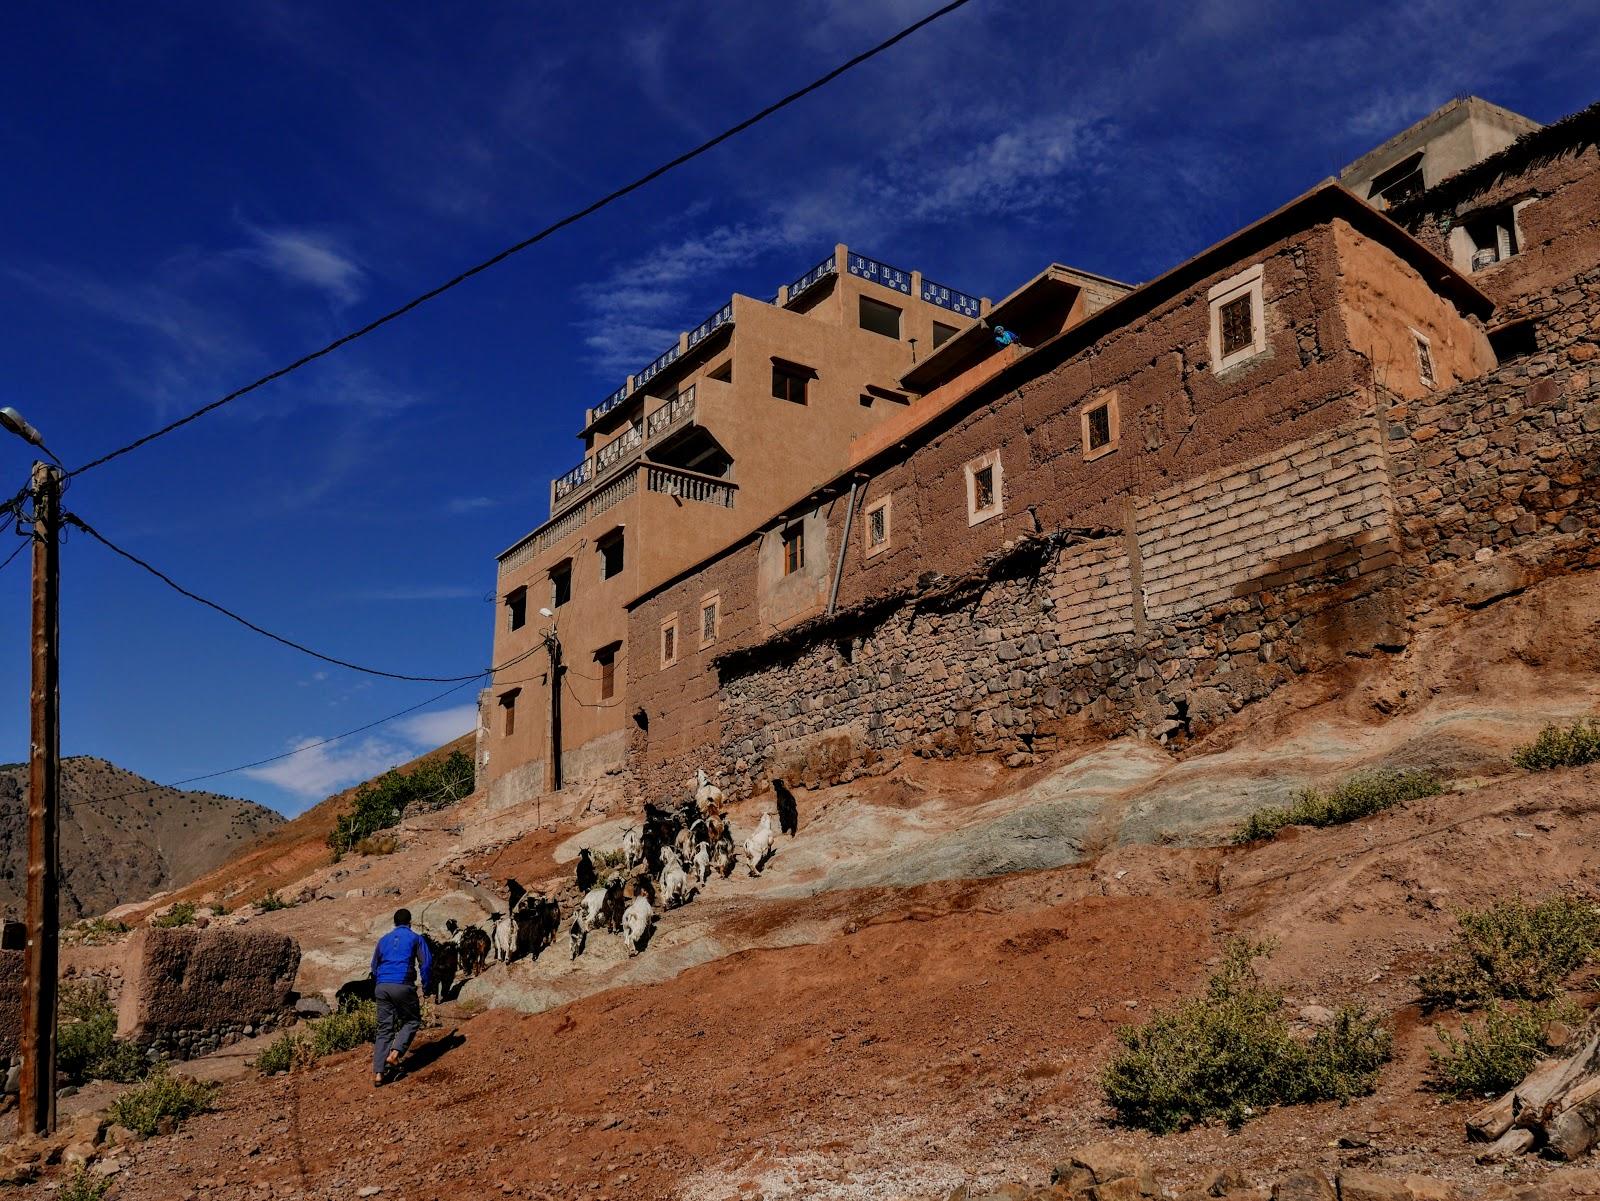 maroko, atrakcje maroko, atlas wysoki, gory atlas, trekking maroko, jebel toubkal